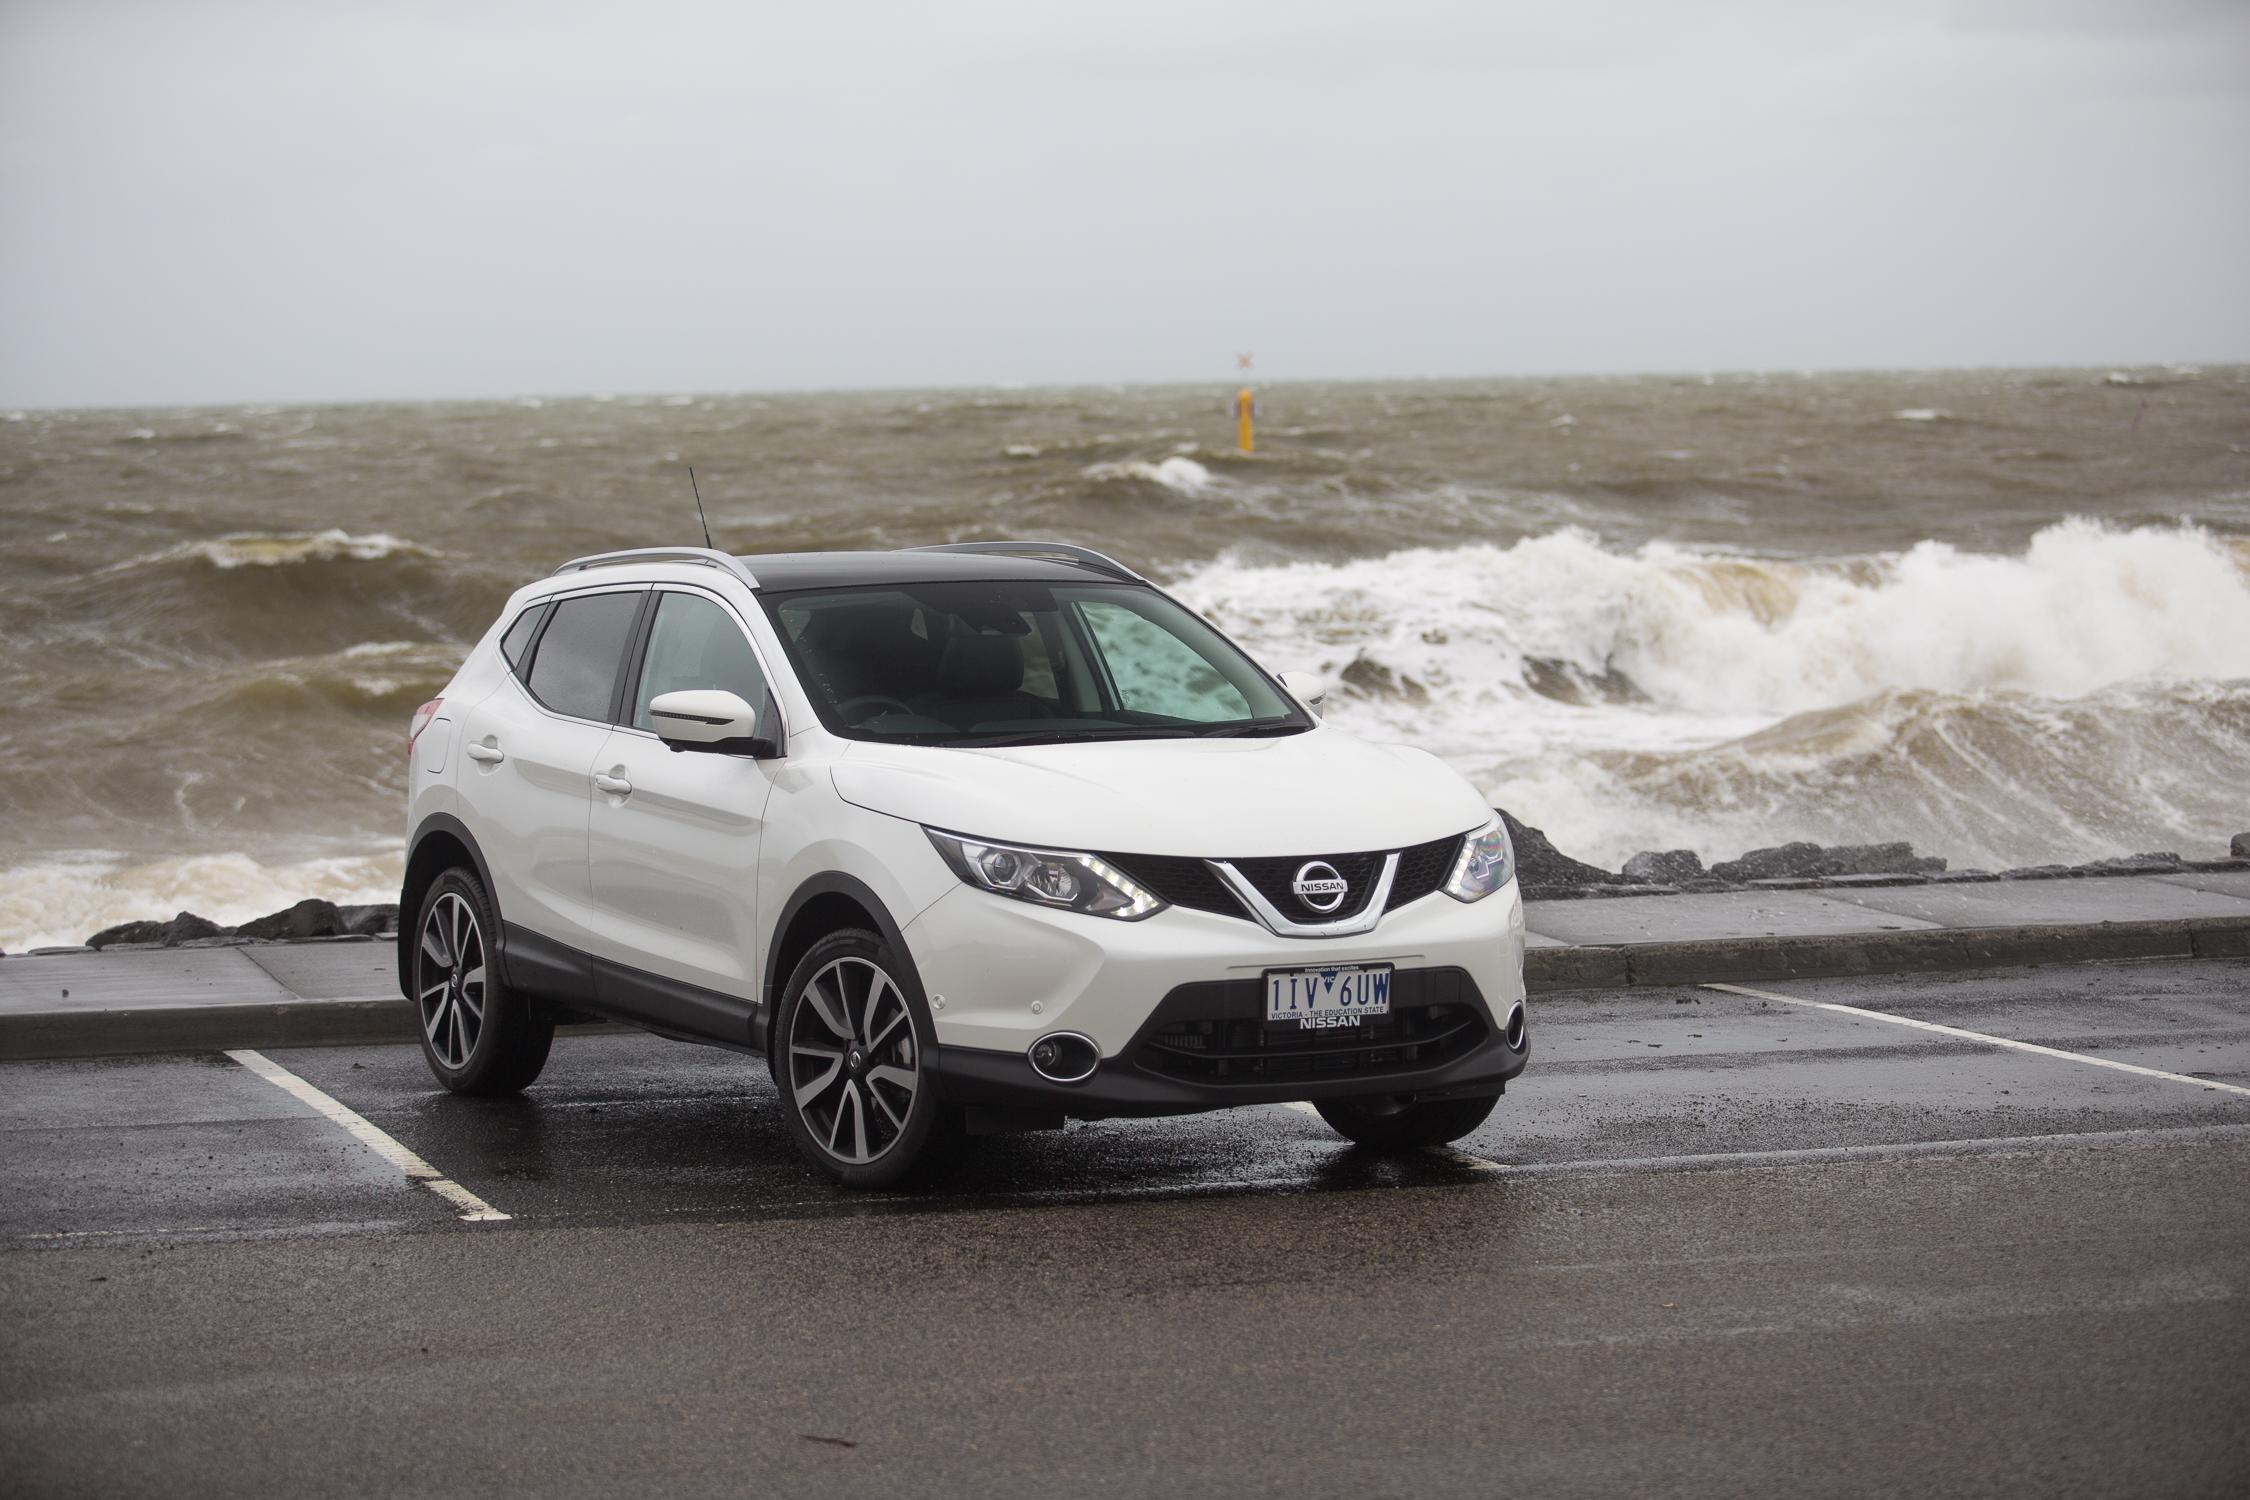 2017 Nissan Qashqai Tl Review Caradvice